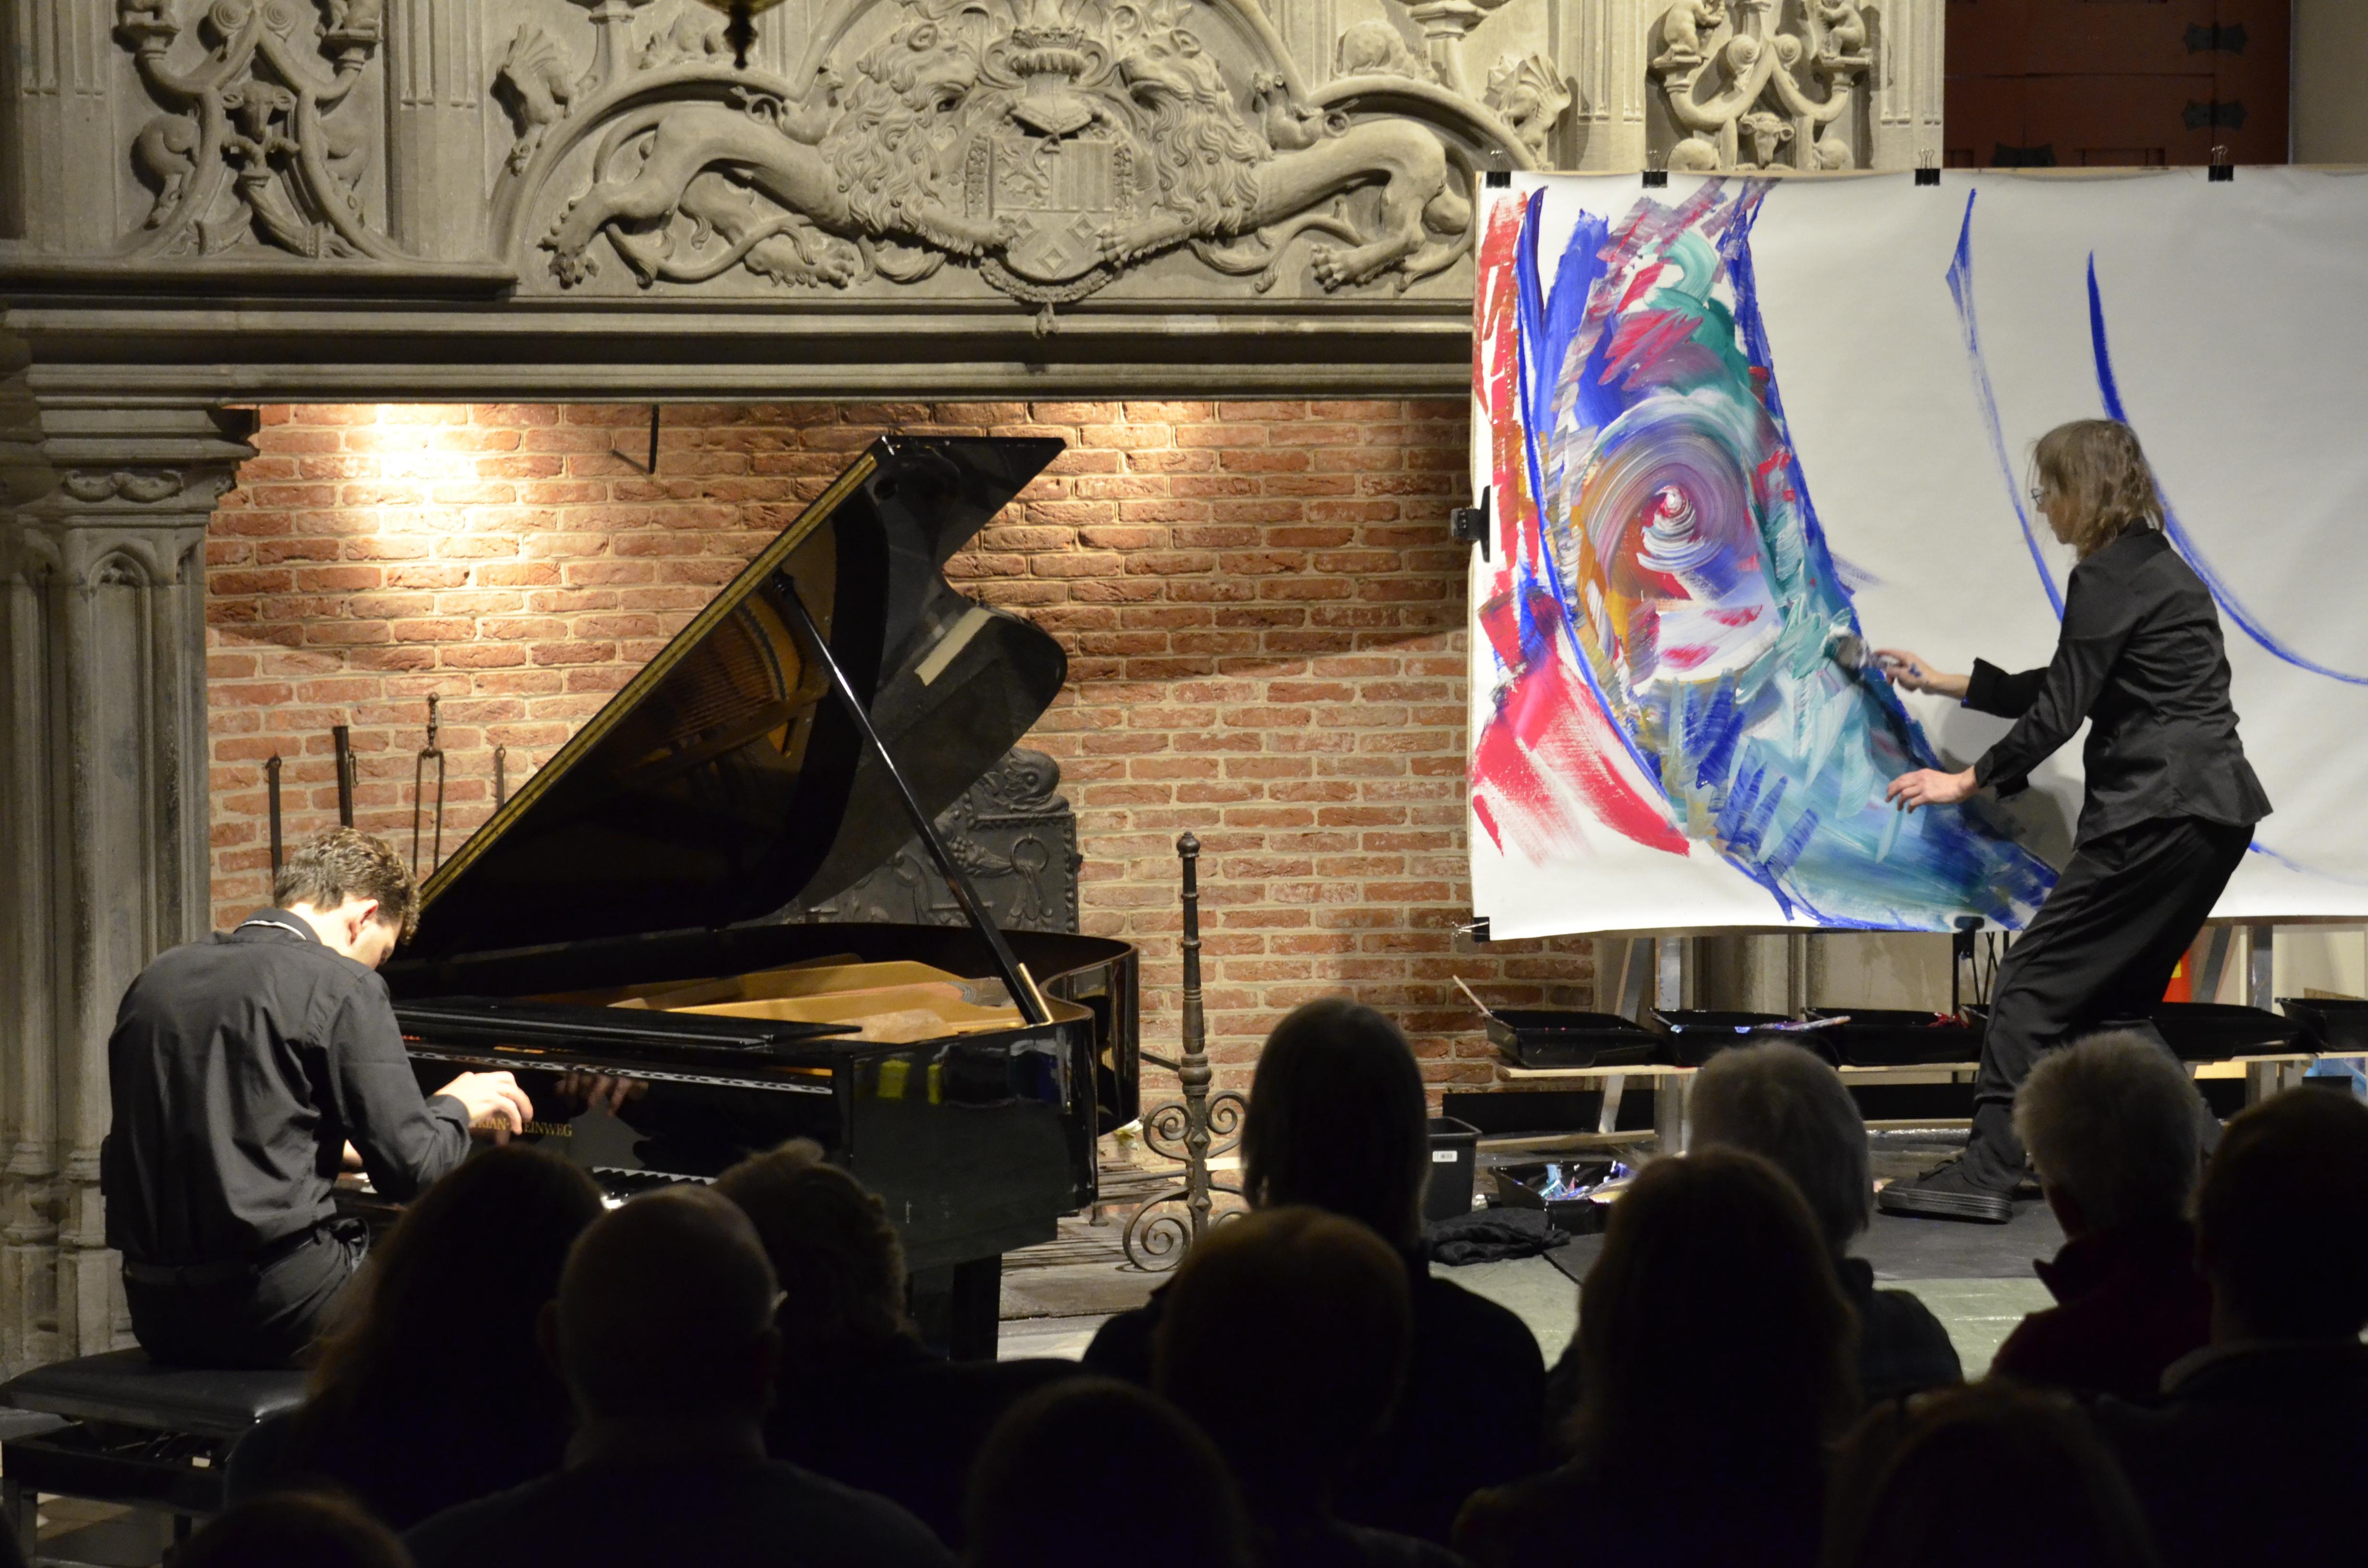 MusicPainting Live with pianist Reinis Zarins and painter Maryleen Schiltkamp at the Markiezenhof, Bergen op Zoom (Netherlands) November 2017